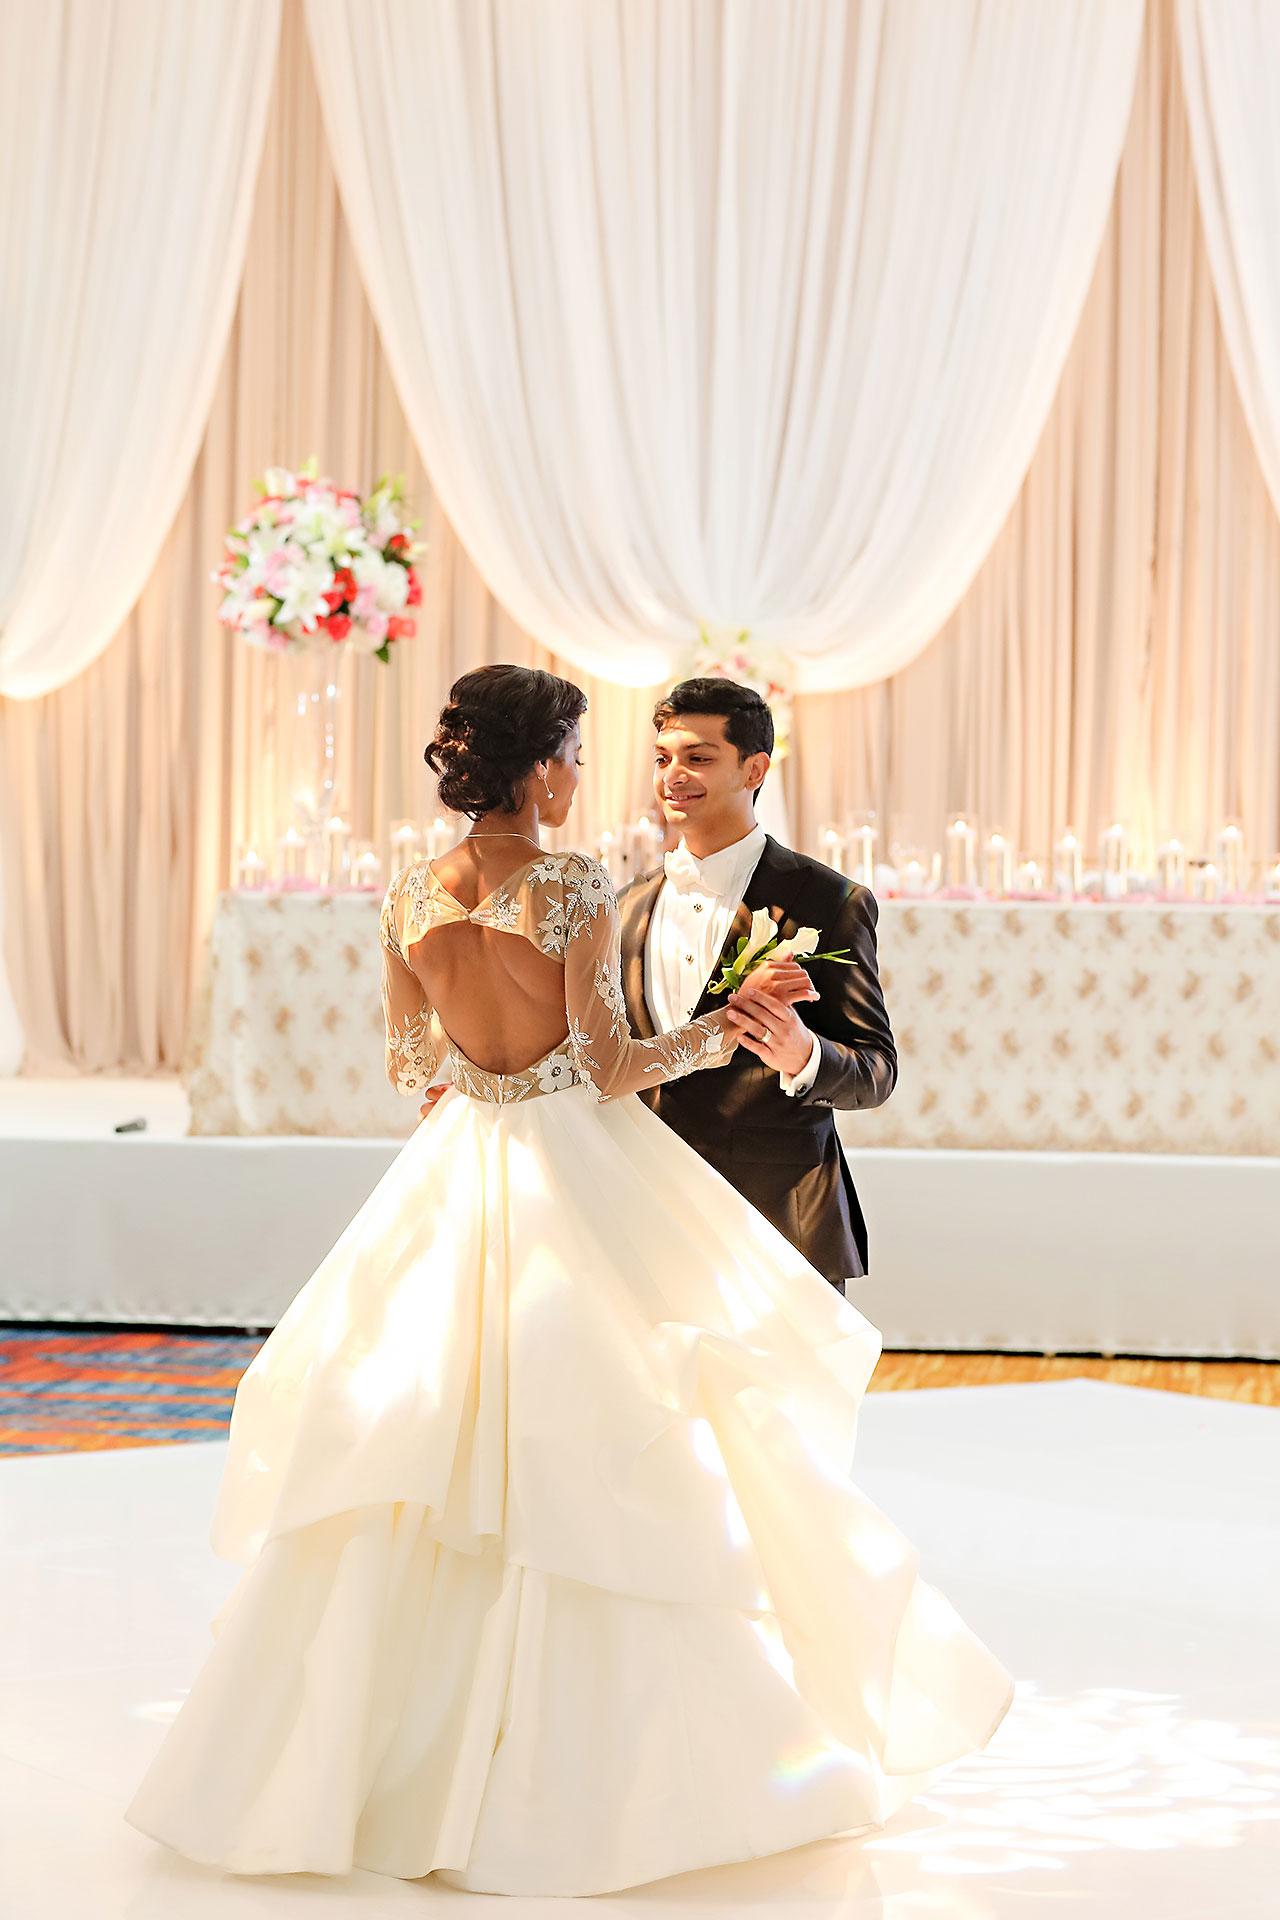 Joie Nikhil JW Marriott Indianapolis Wedding 112